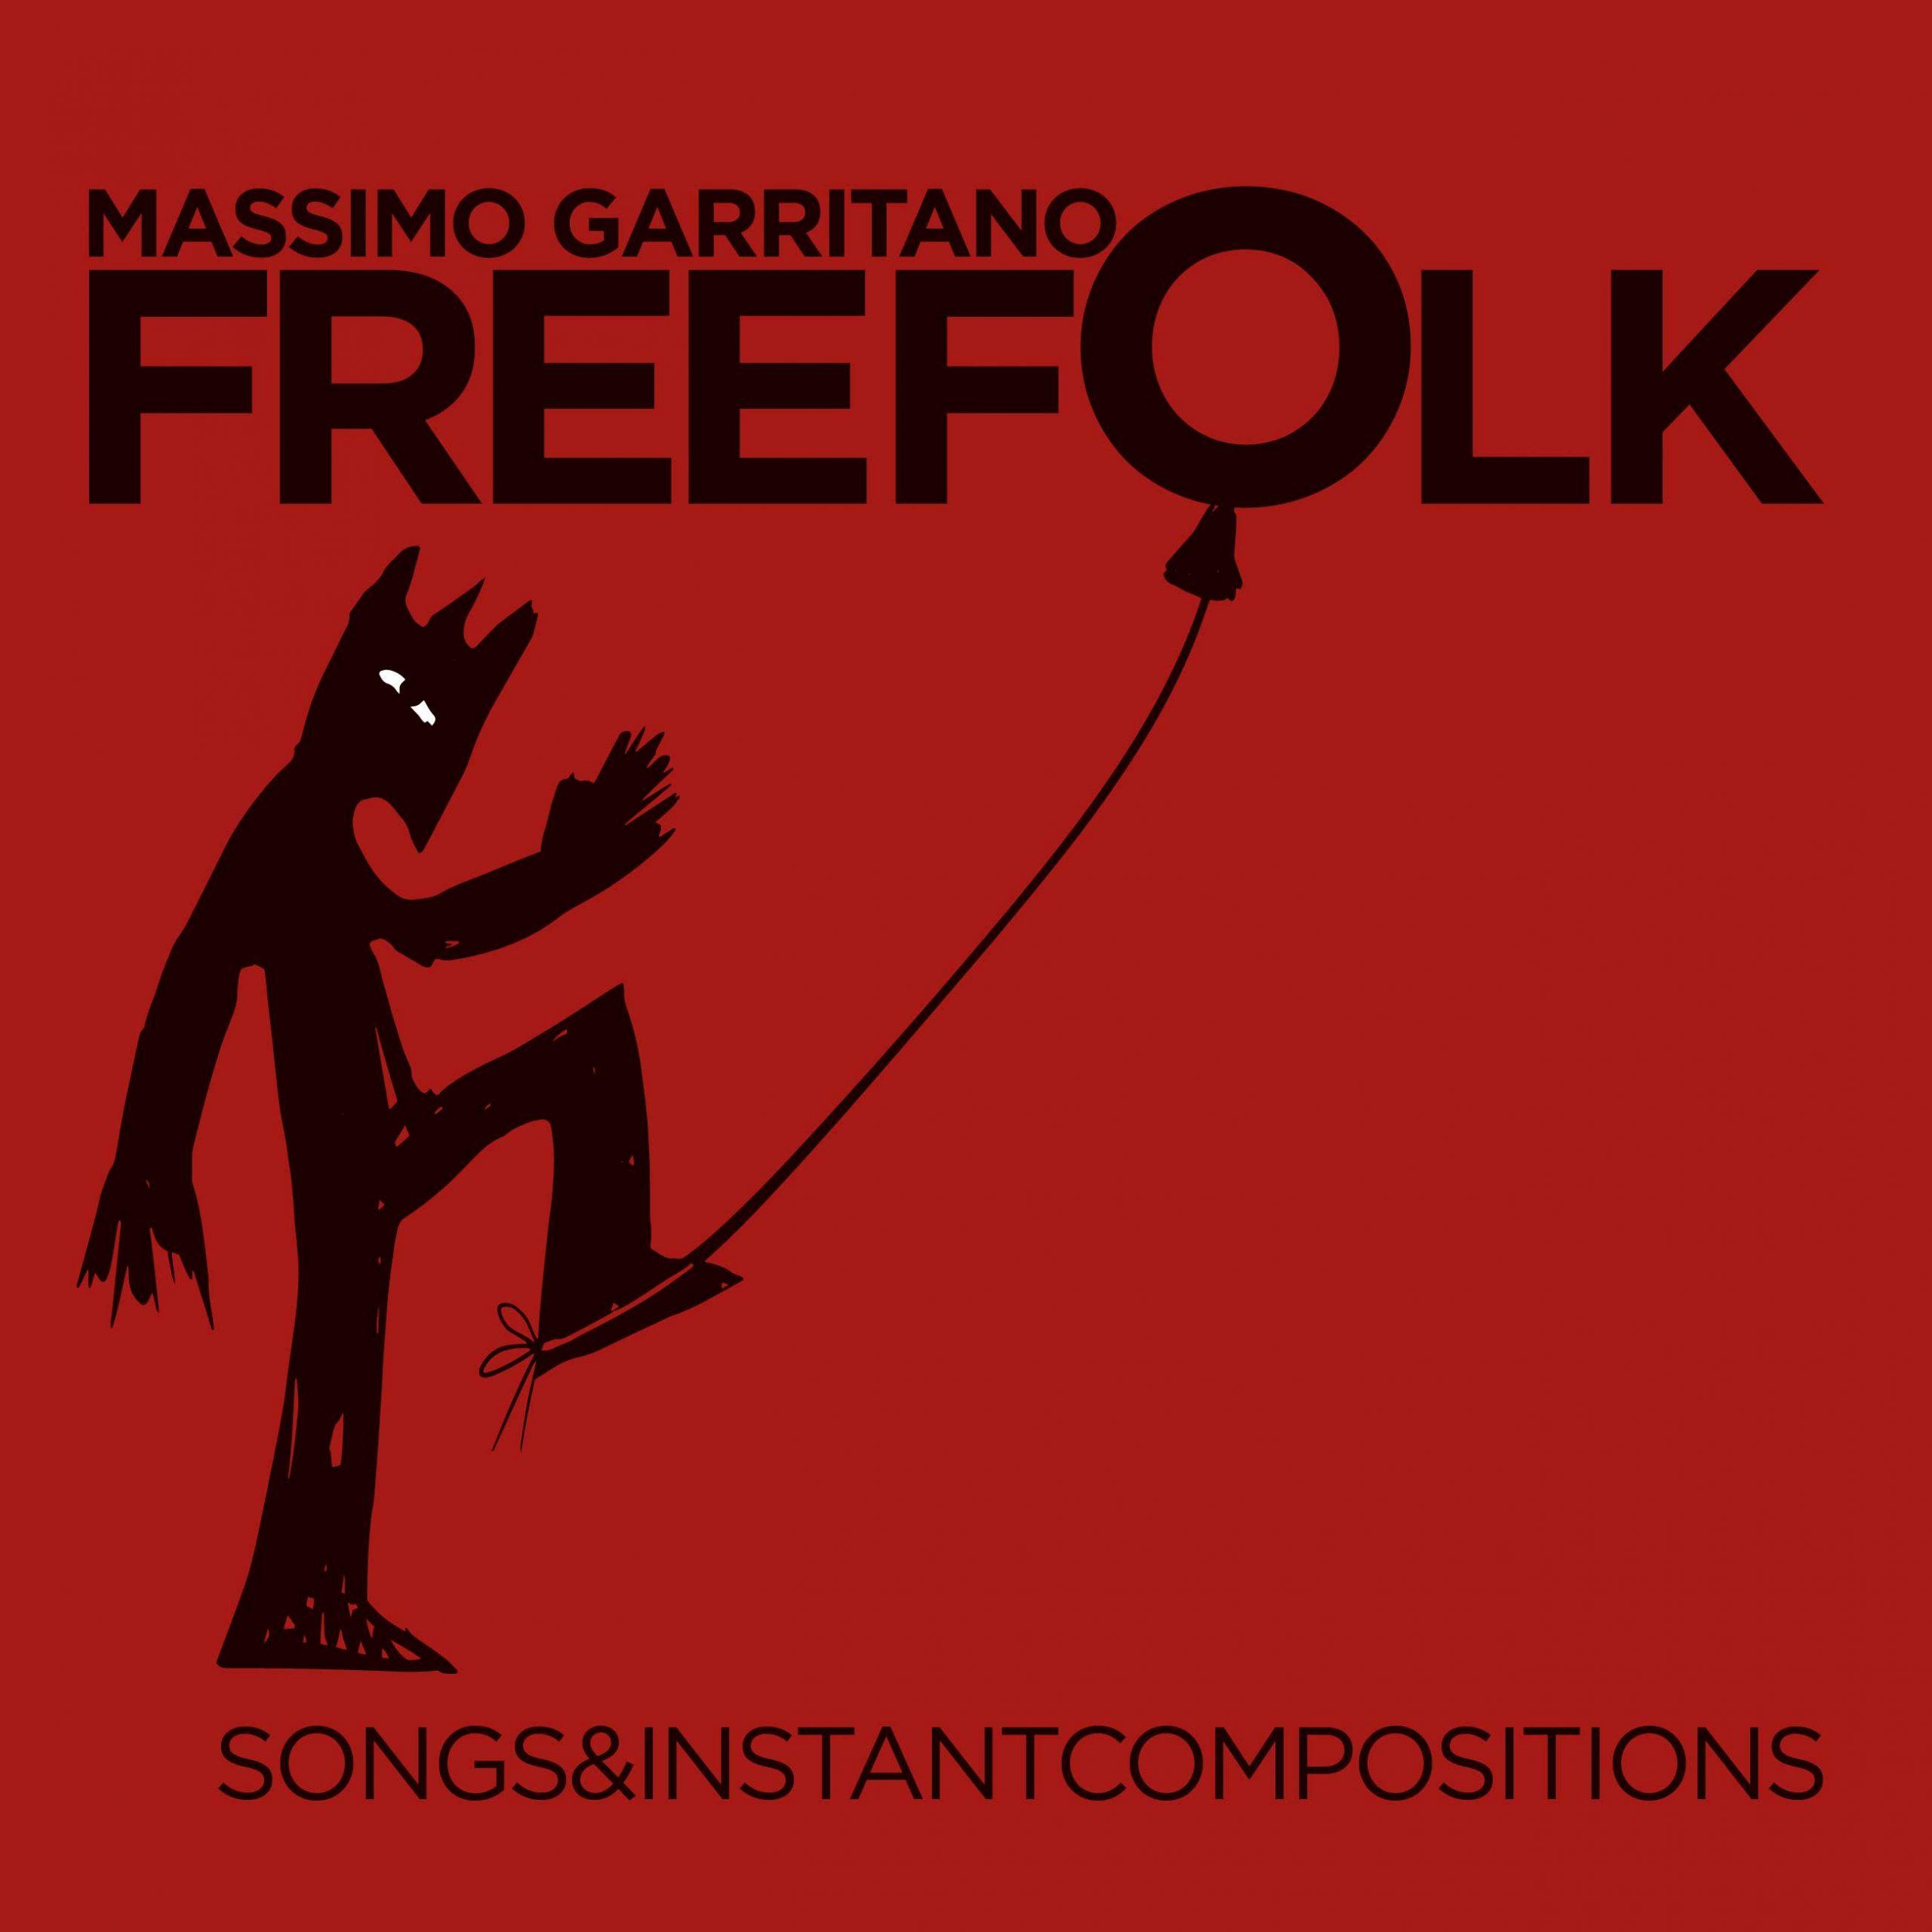 FreeFolk manitu records